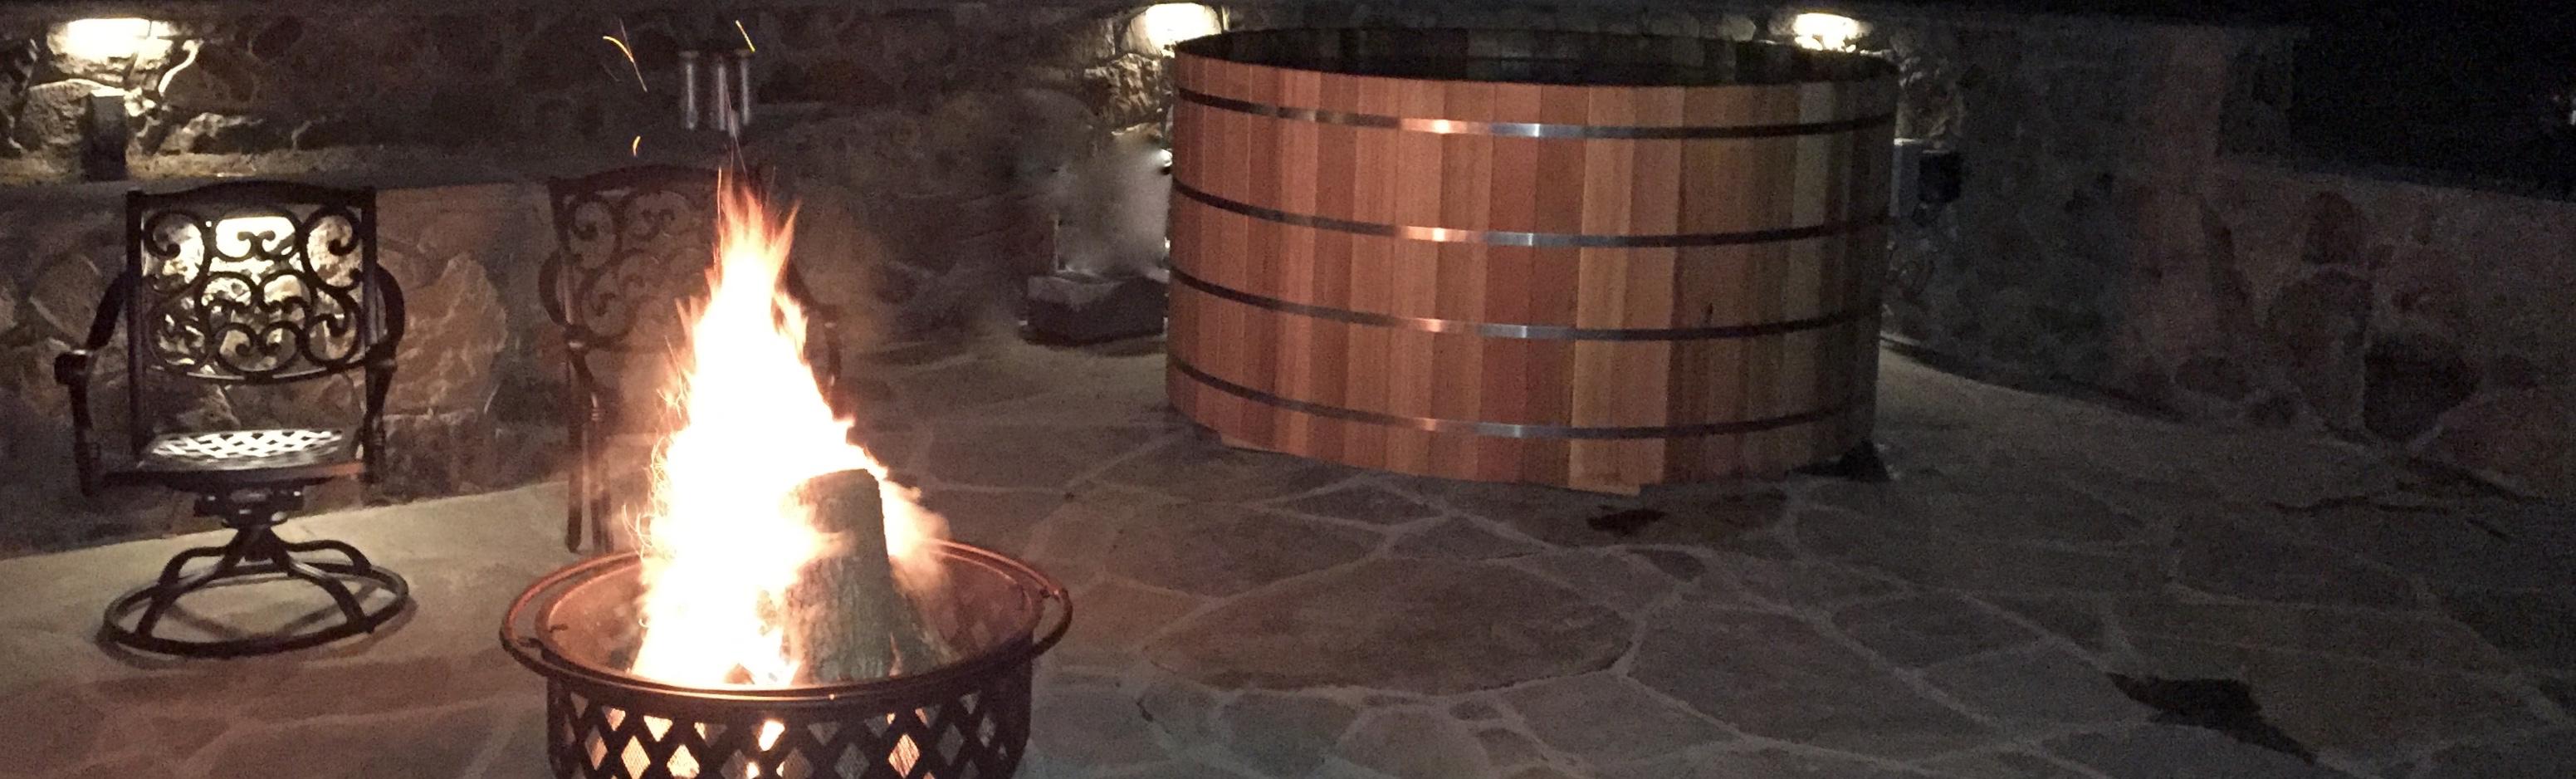 Cedar Hot Tub   Japanese Soaking Tubs   Free Standing Bathtubs ...